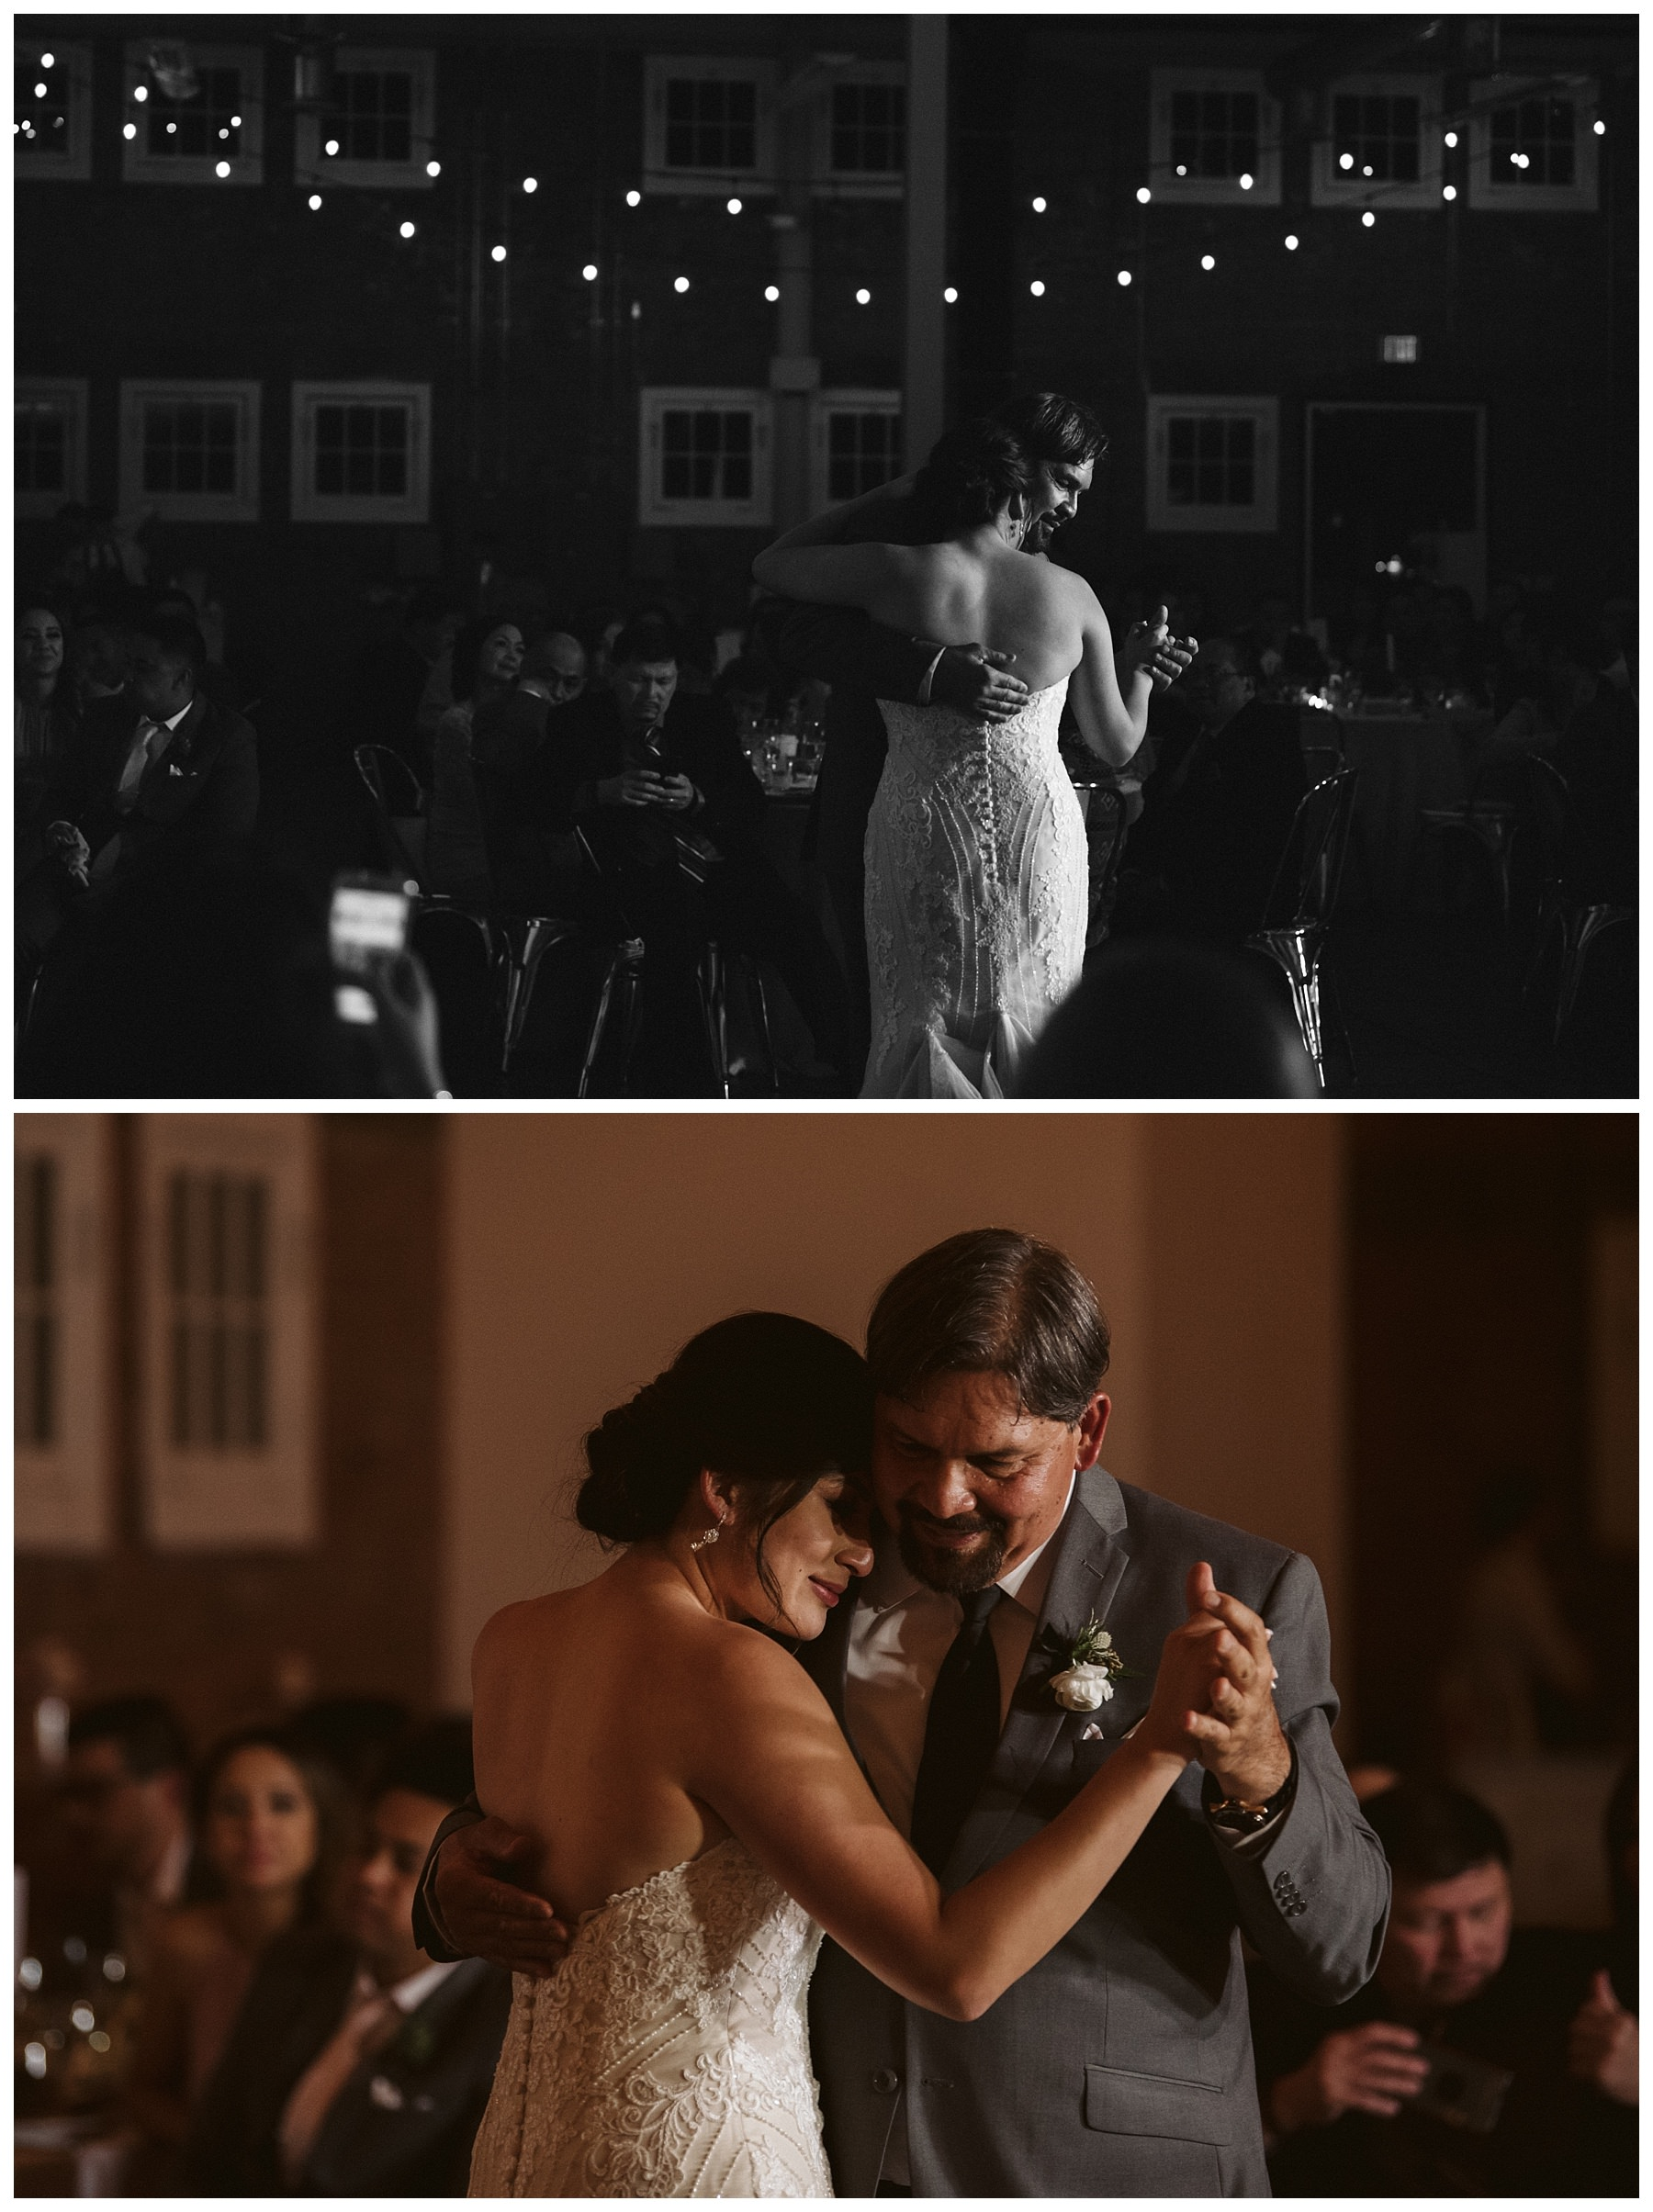 Brick_San_Diego_wedding_0054.jpg